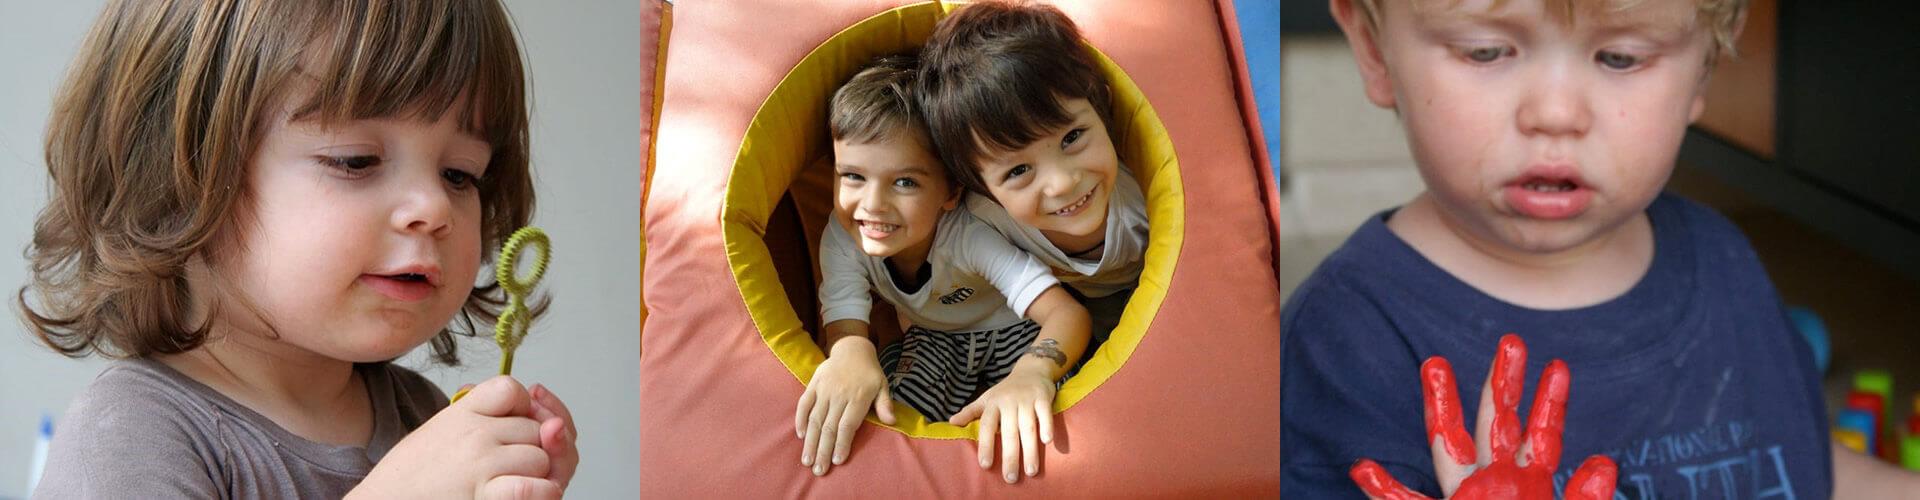 Integrasense Terapia Ocupacional Infantil